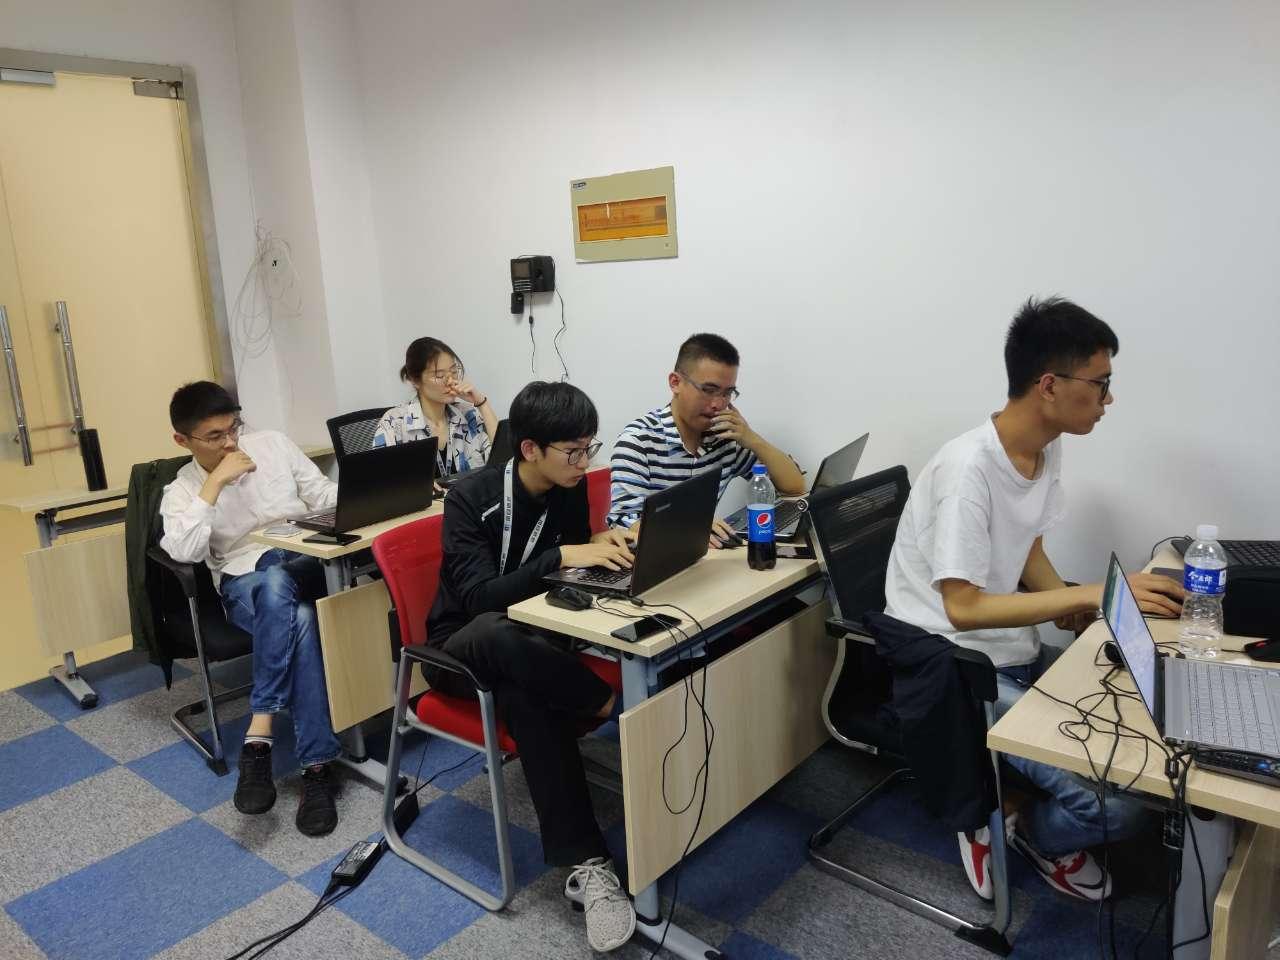 iS-RPA 技术认证培训 无锡 201901010 班